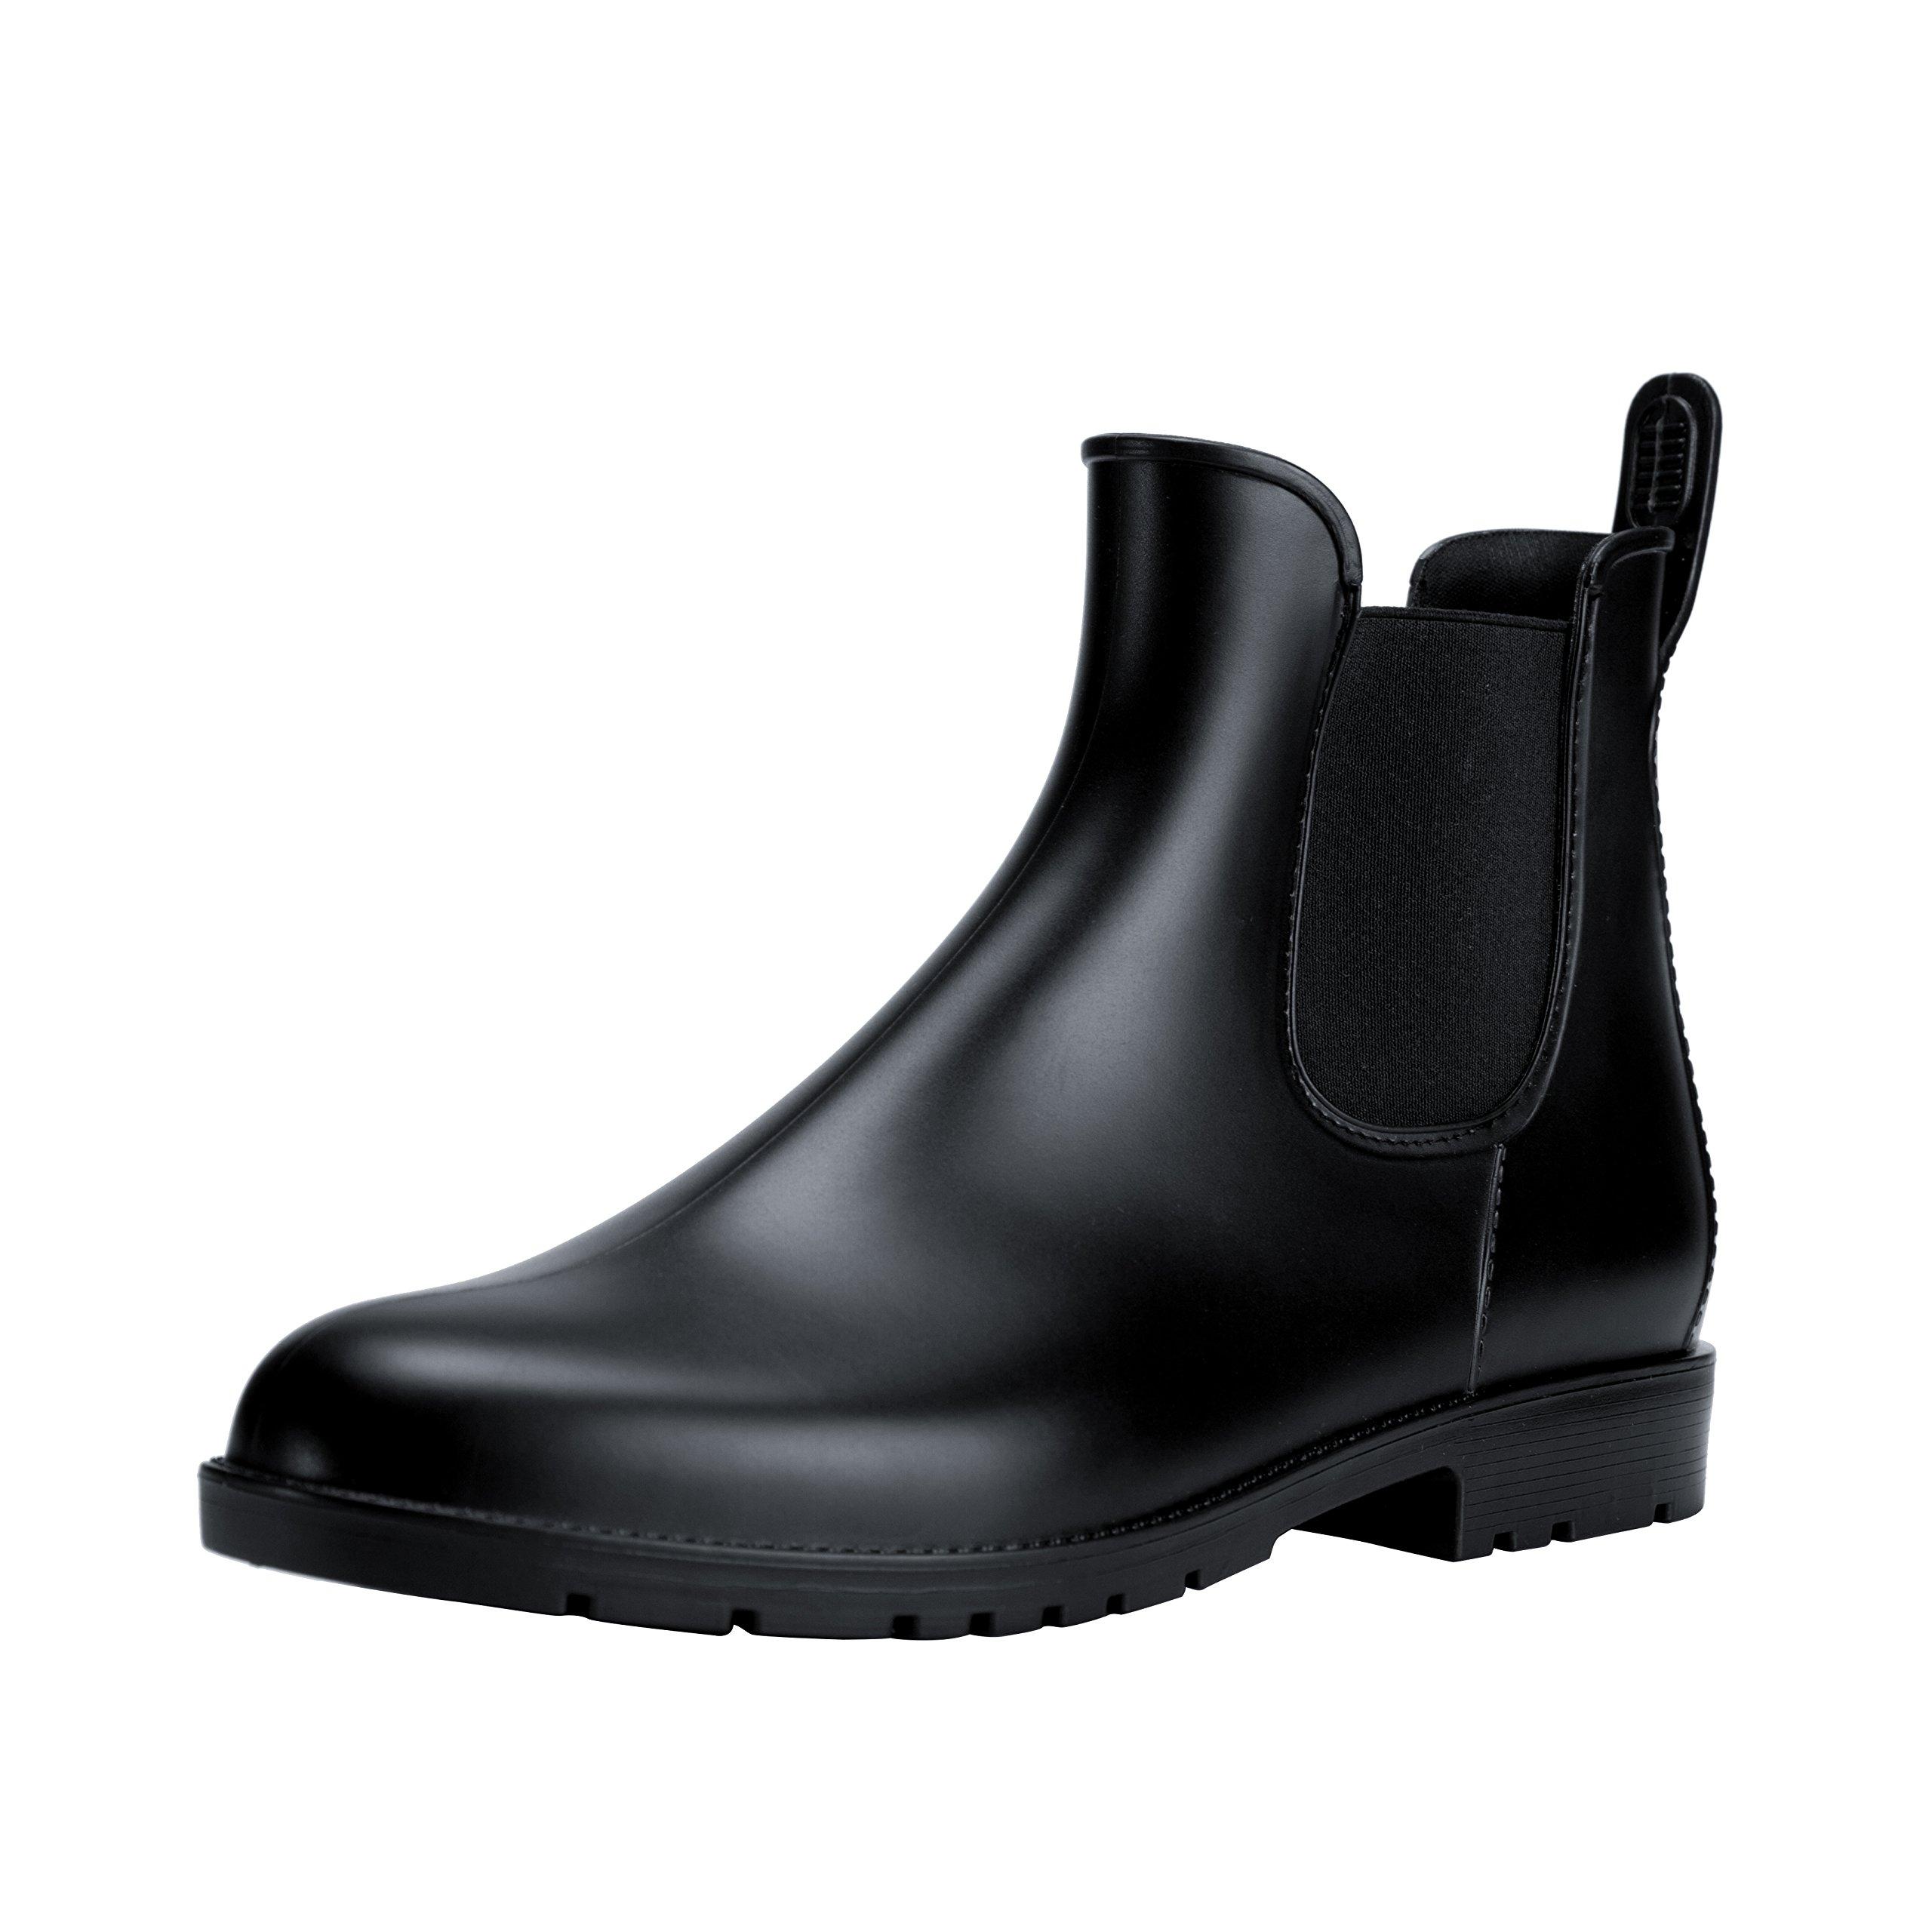 Comwarm Womens Anti Slip Ankle Rain Boots Waterproof Slip On Rain Shoes Elastic Chelsea Black Rain Booties